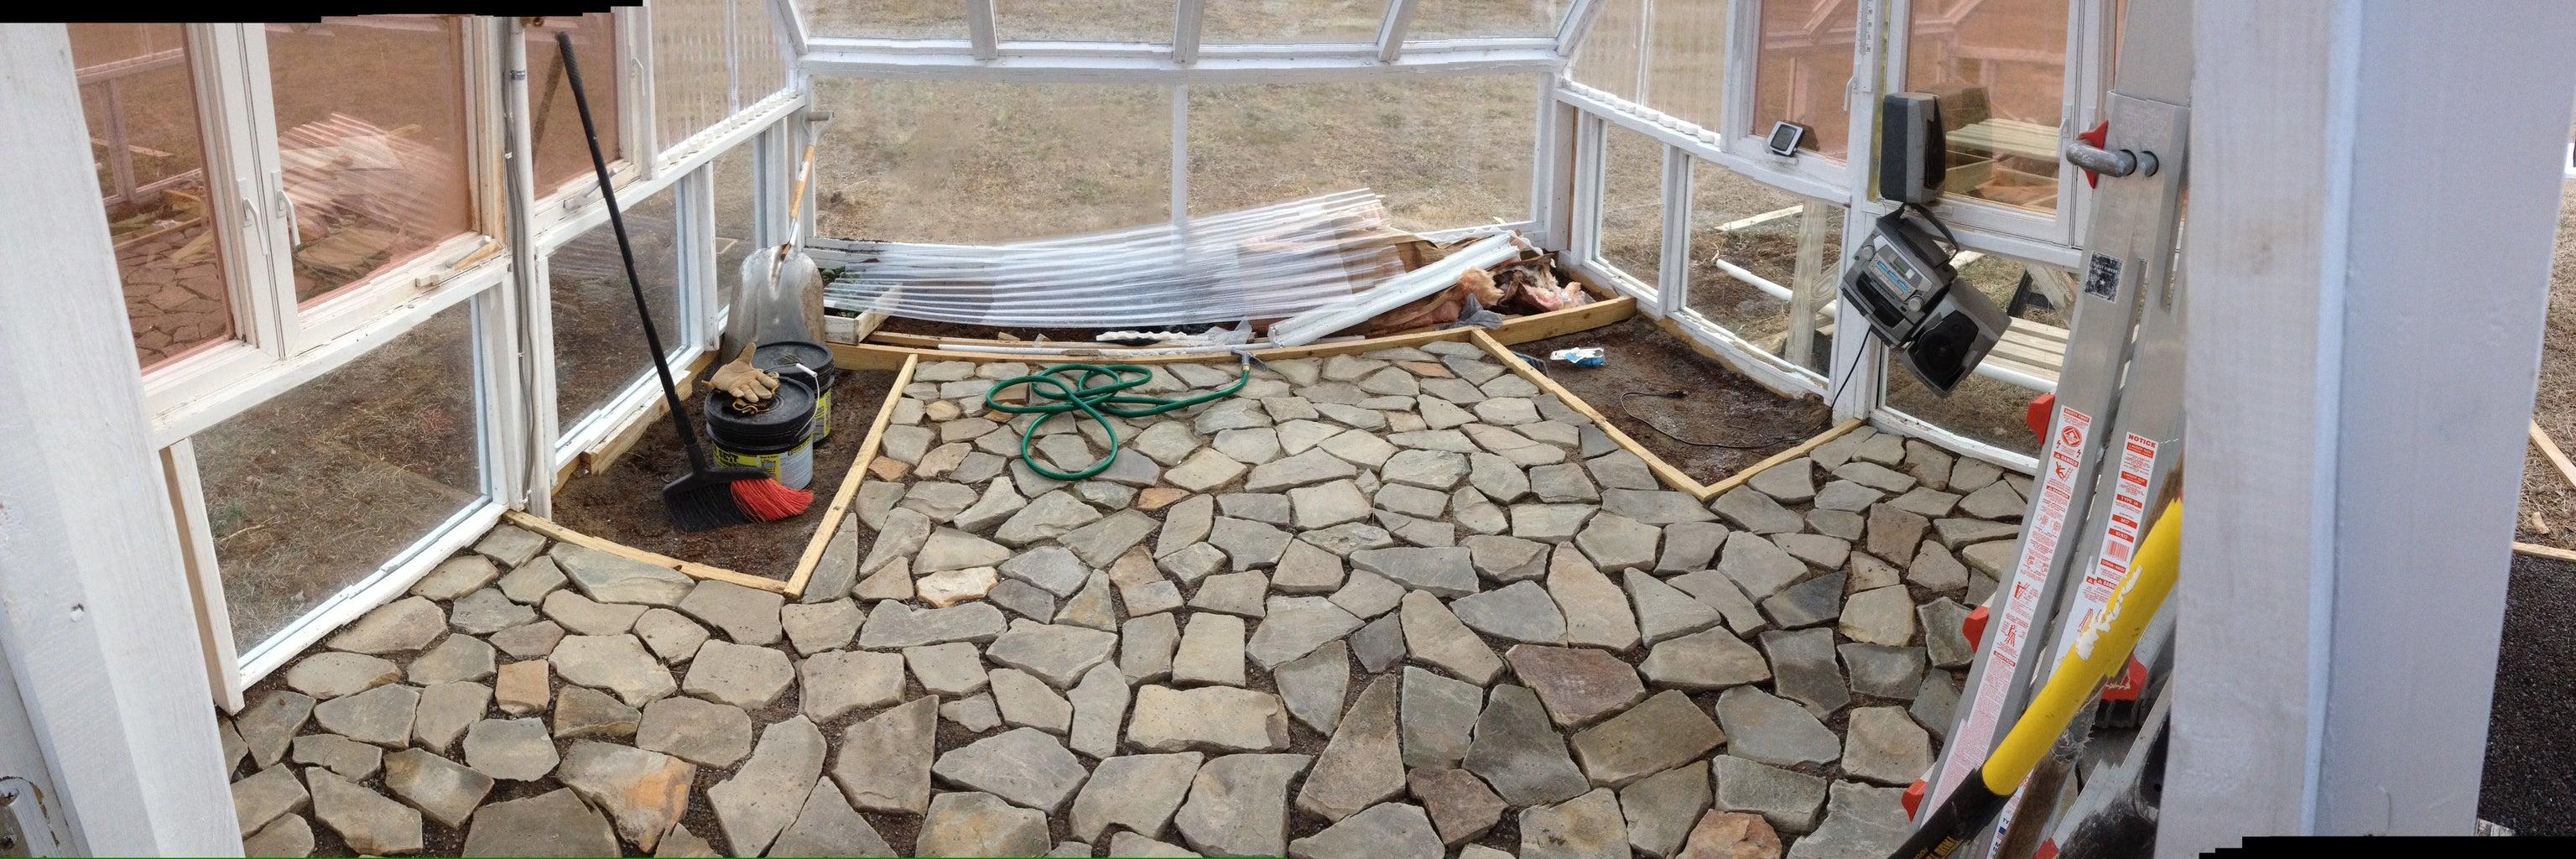 Flagstone Floor Installation - Heat Storage Device.